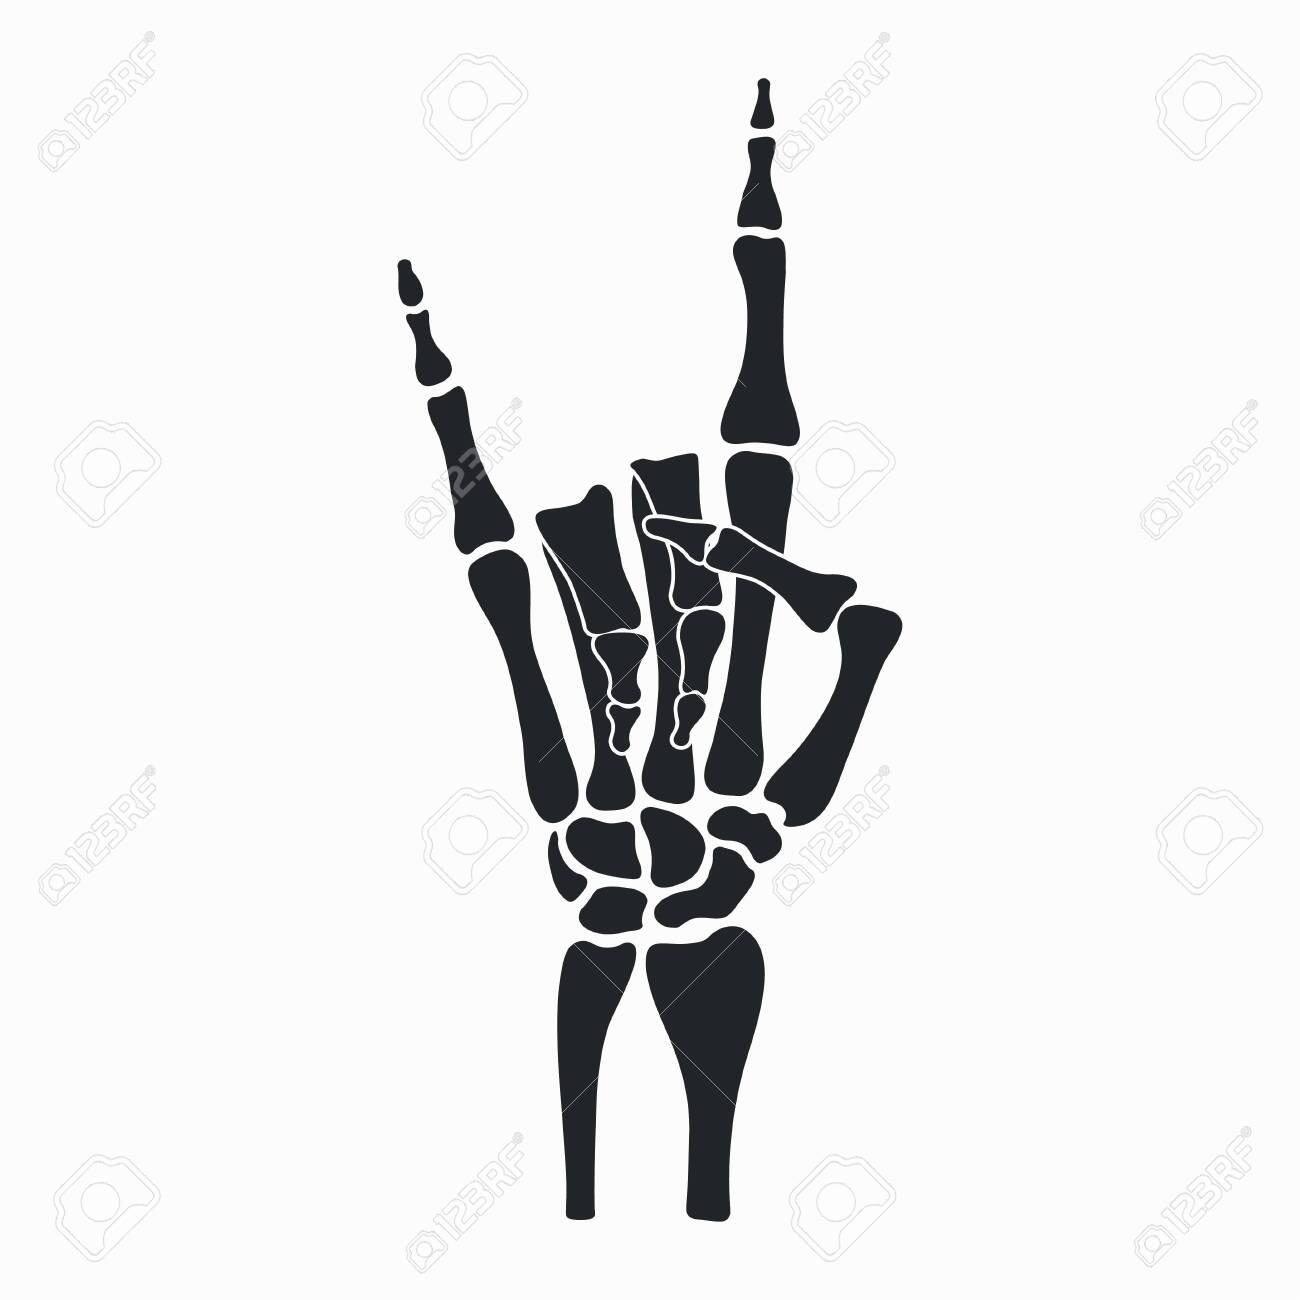 Rock skeleton hand. Heavy metal sign - horns. Rock-n-roll gesture from fingers bones. Vector illustration. - 125470914